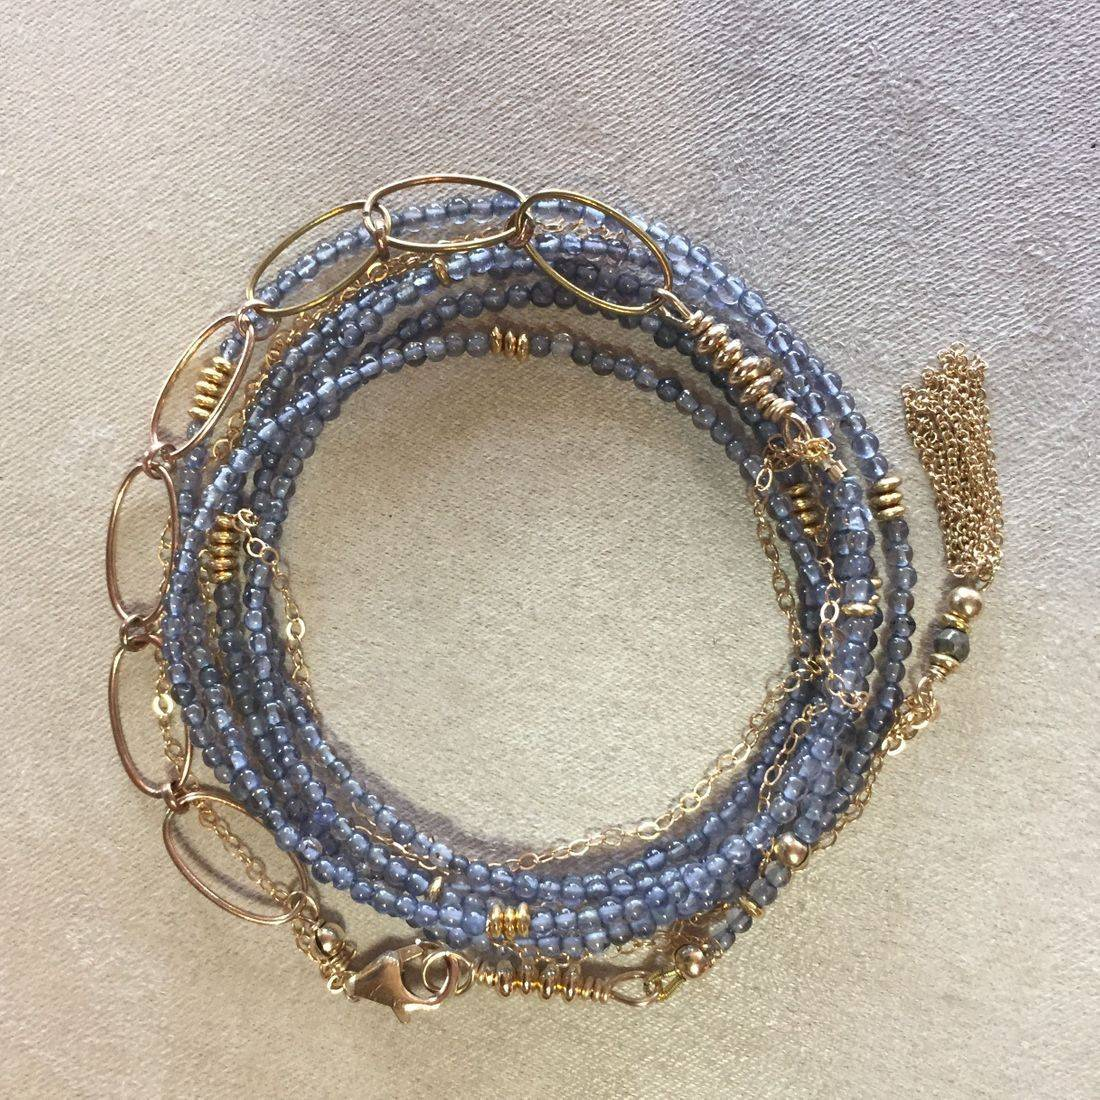 gemstone wrap bracelet, AAA iolite, 14k gold filled chain, gold tassel